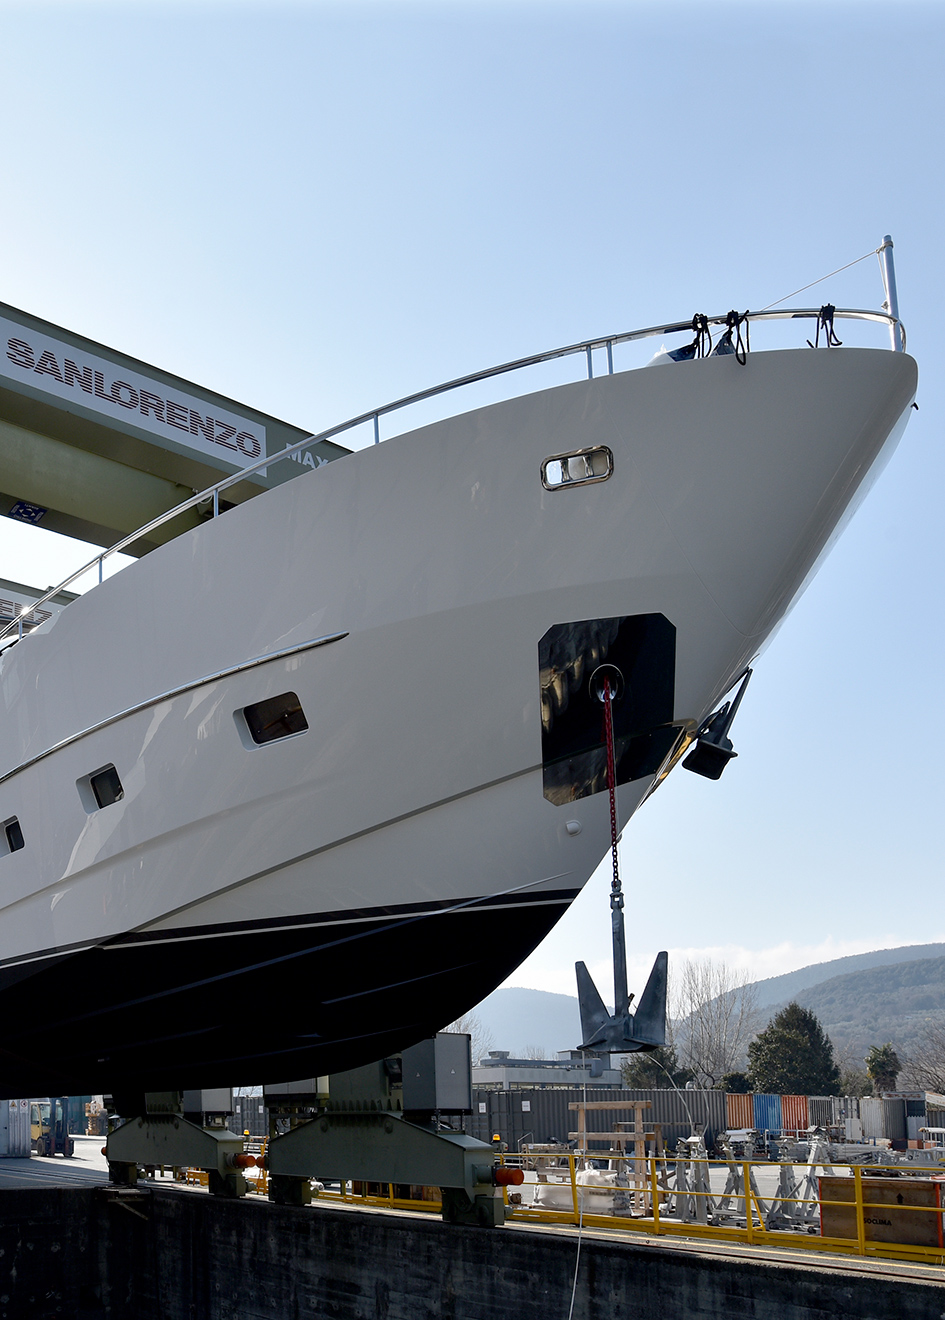 Taiji-is-part-of-the-sanlorenzo-sL86-range-of-fast-planing-yachts